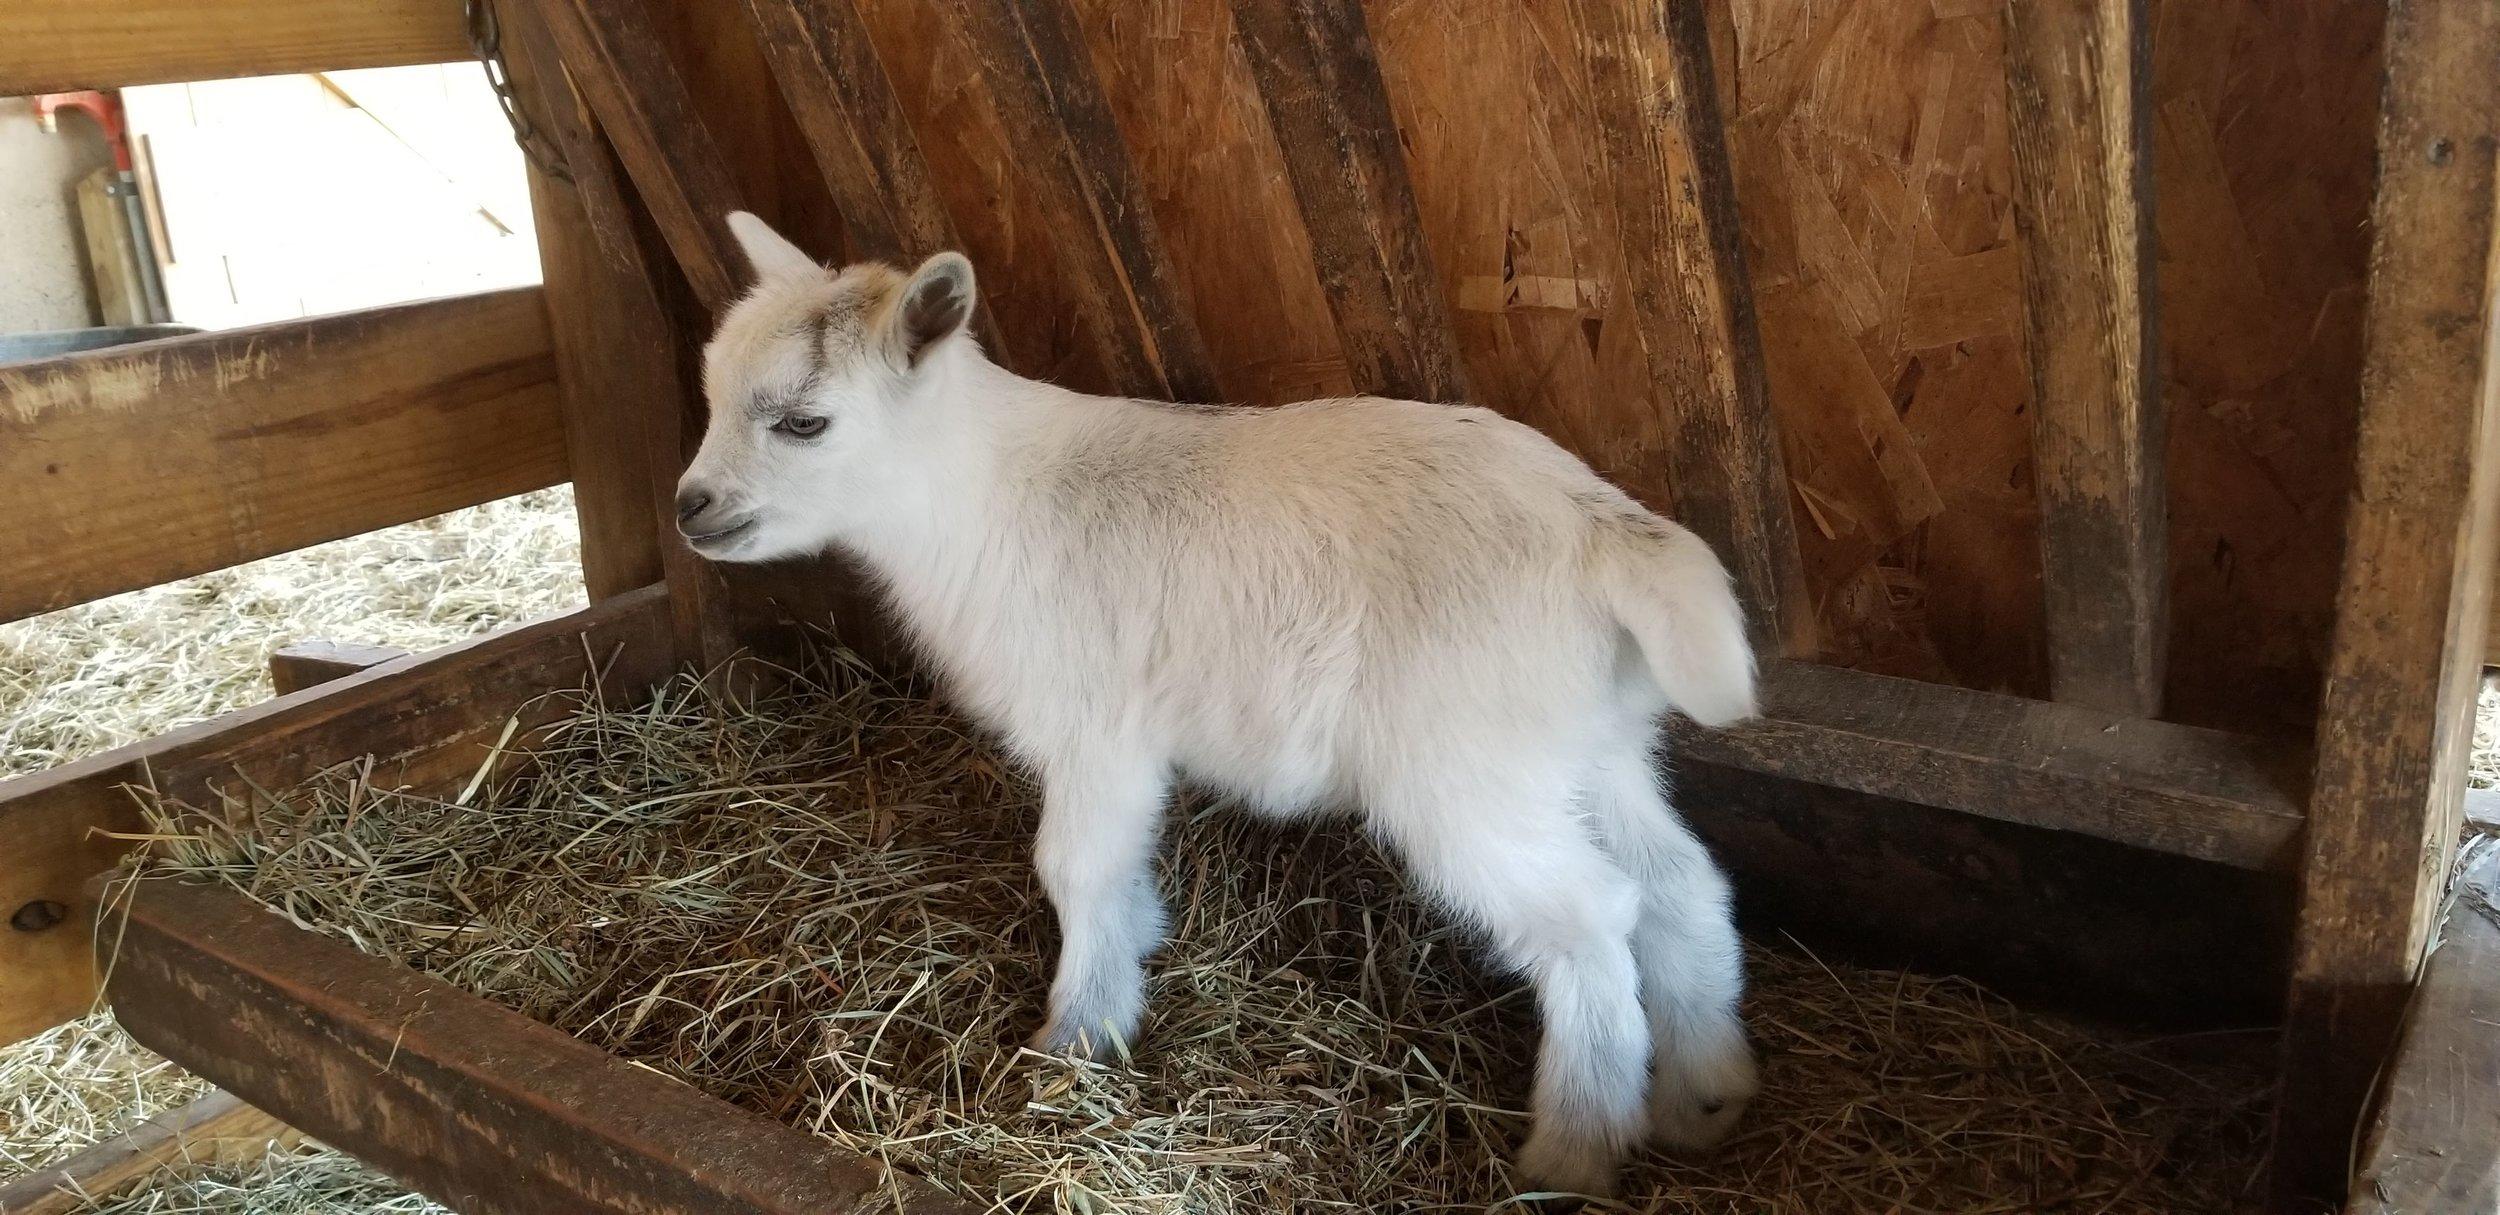 SMALL GIRL'S BABE- GIRL $175 3/4 FAINTER 1/4 PYGMY. BORN SPRING 2019 READY MAY 20TH